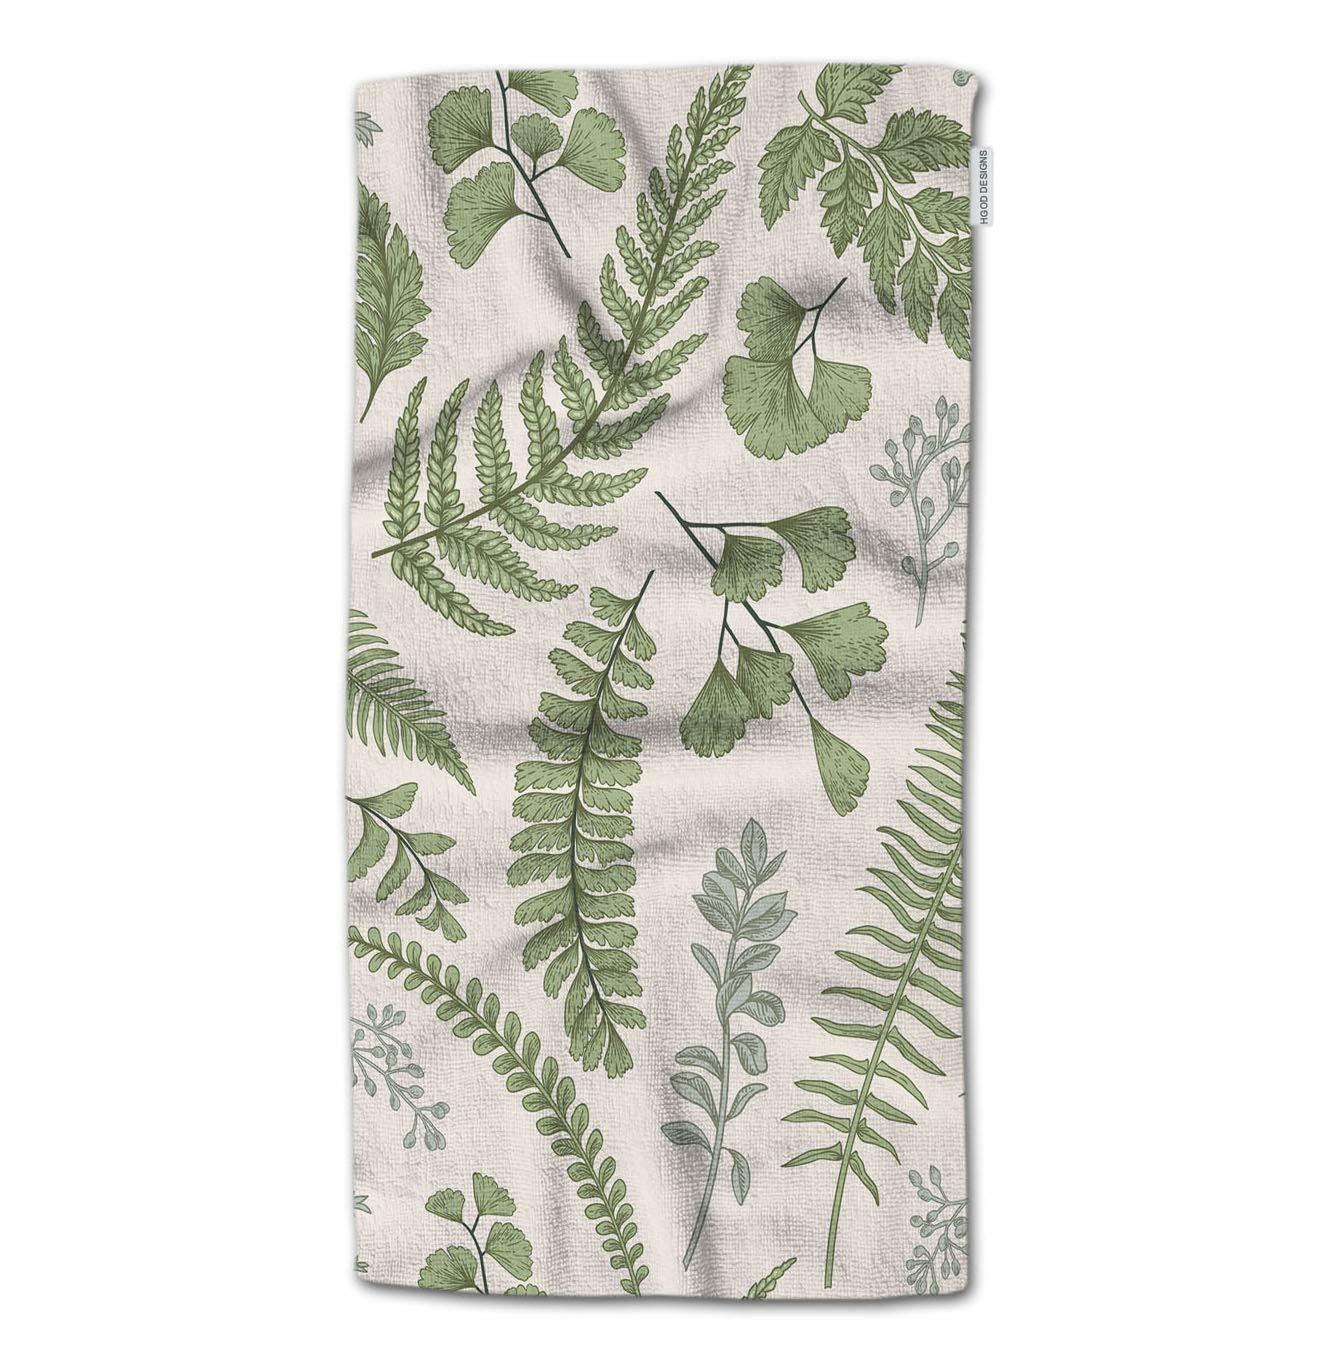 HGOD DESIGNS Bath Towel Leaves,Green Leaves and Fern Pattern Bath Towel Throw Blanket Beach Towel 64'' Lx32 W